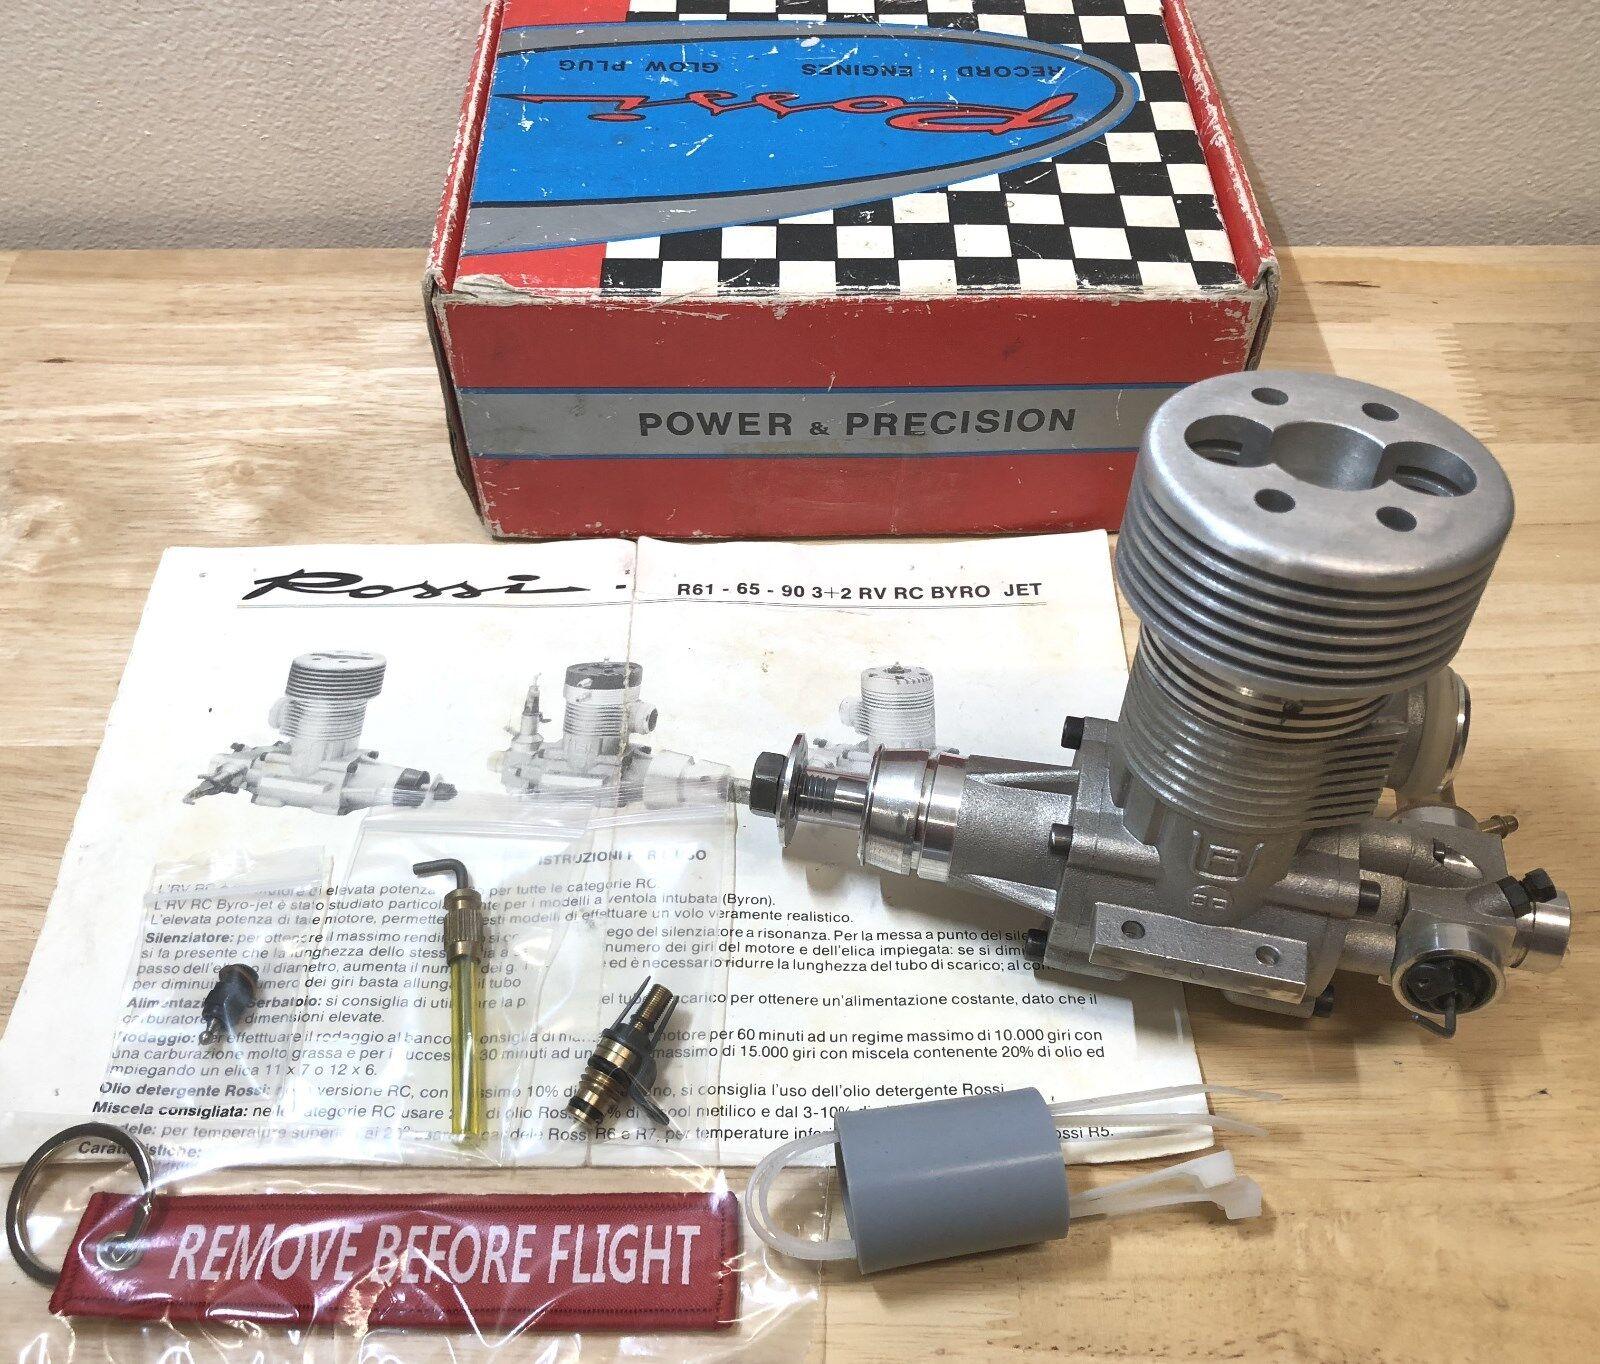 Rossi 90 R Ducted Fan Engine Rear Exhaust NIB